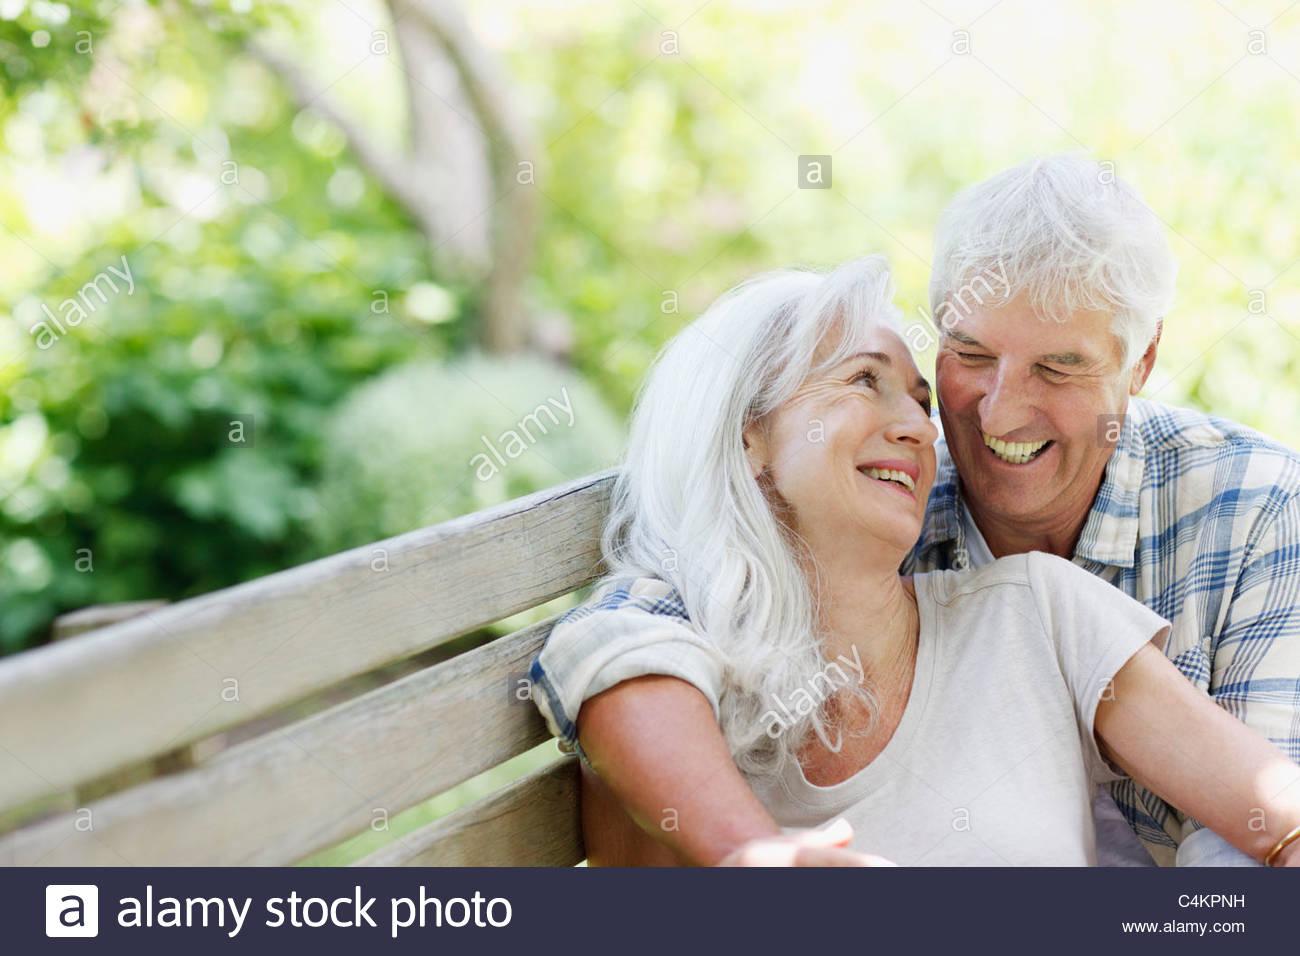 Senior couple on bench - Stock Image